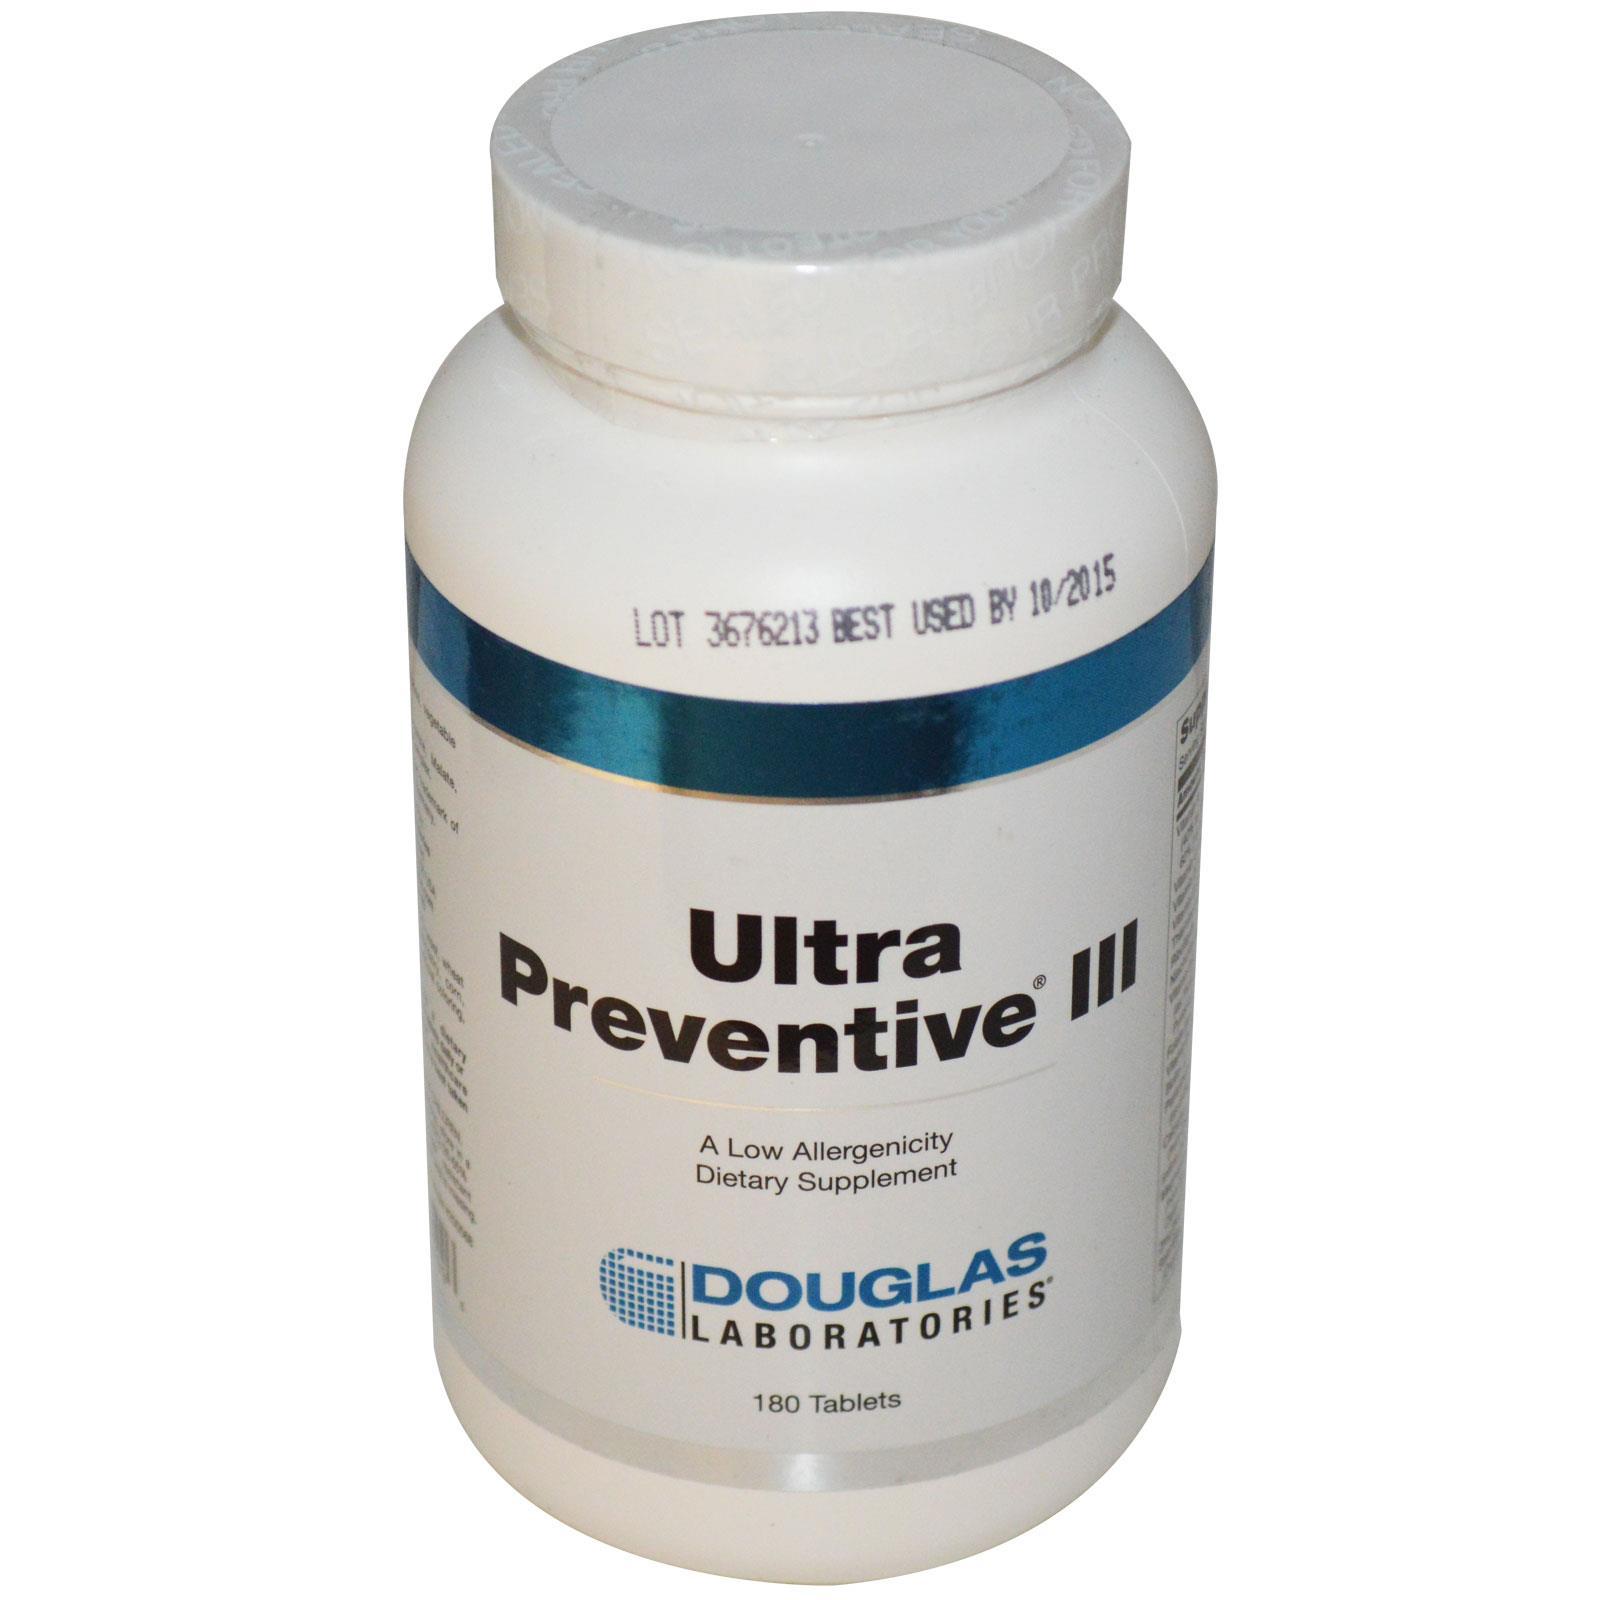 Douglas Laboratories,Ultra preventieve III (180 tabletten)